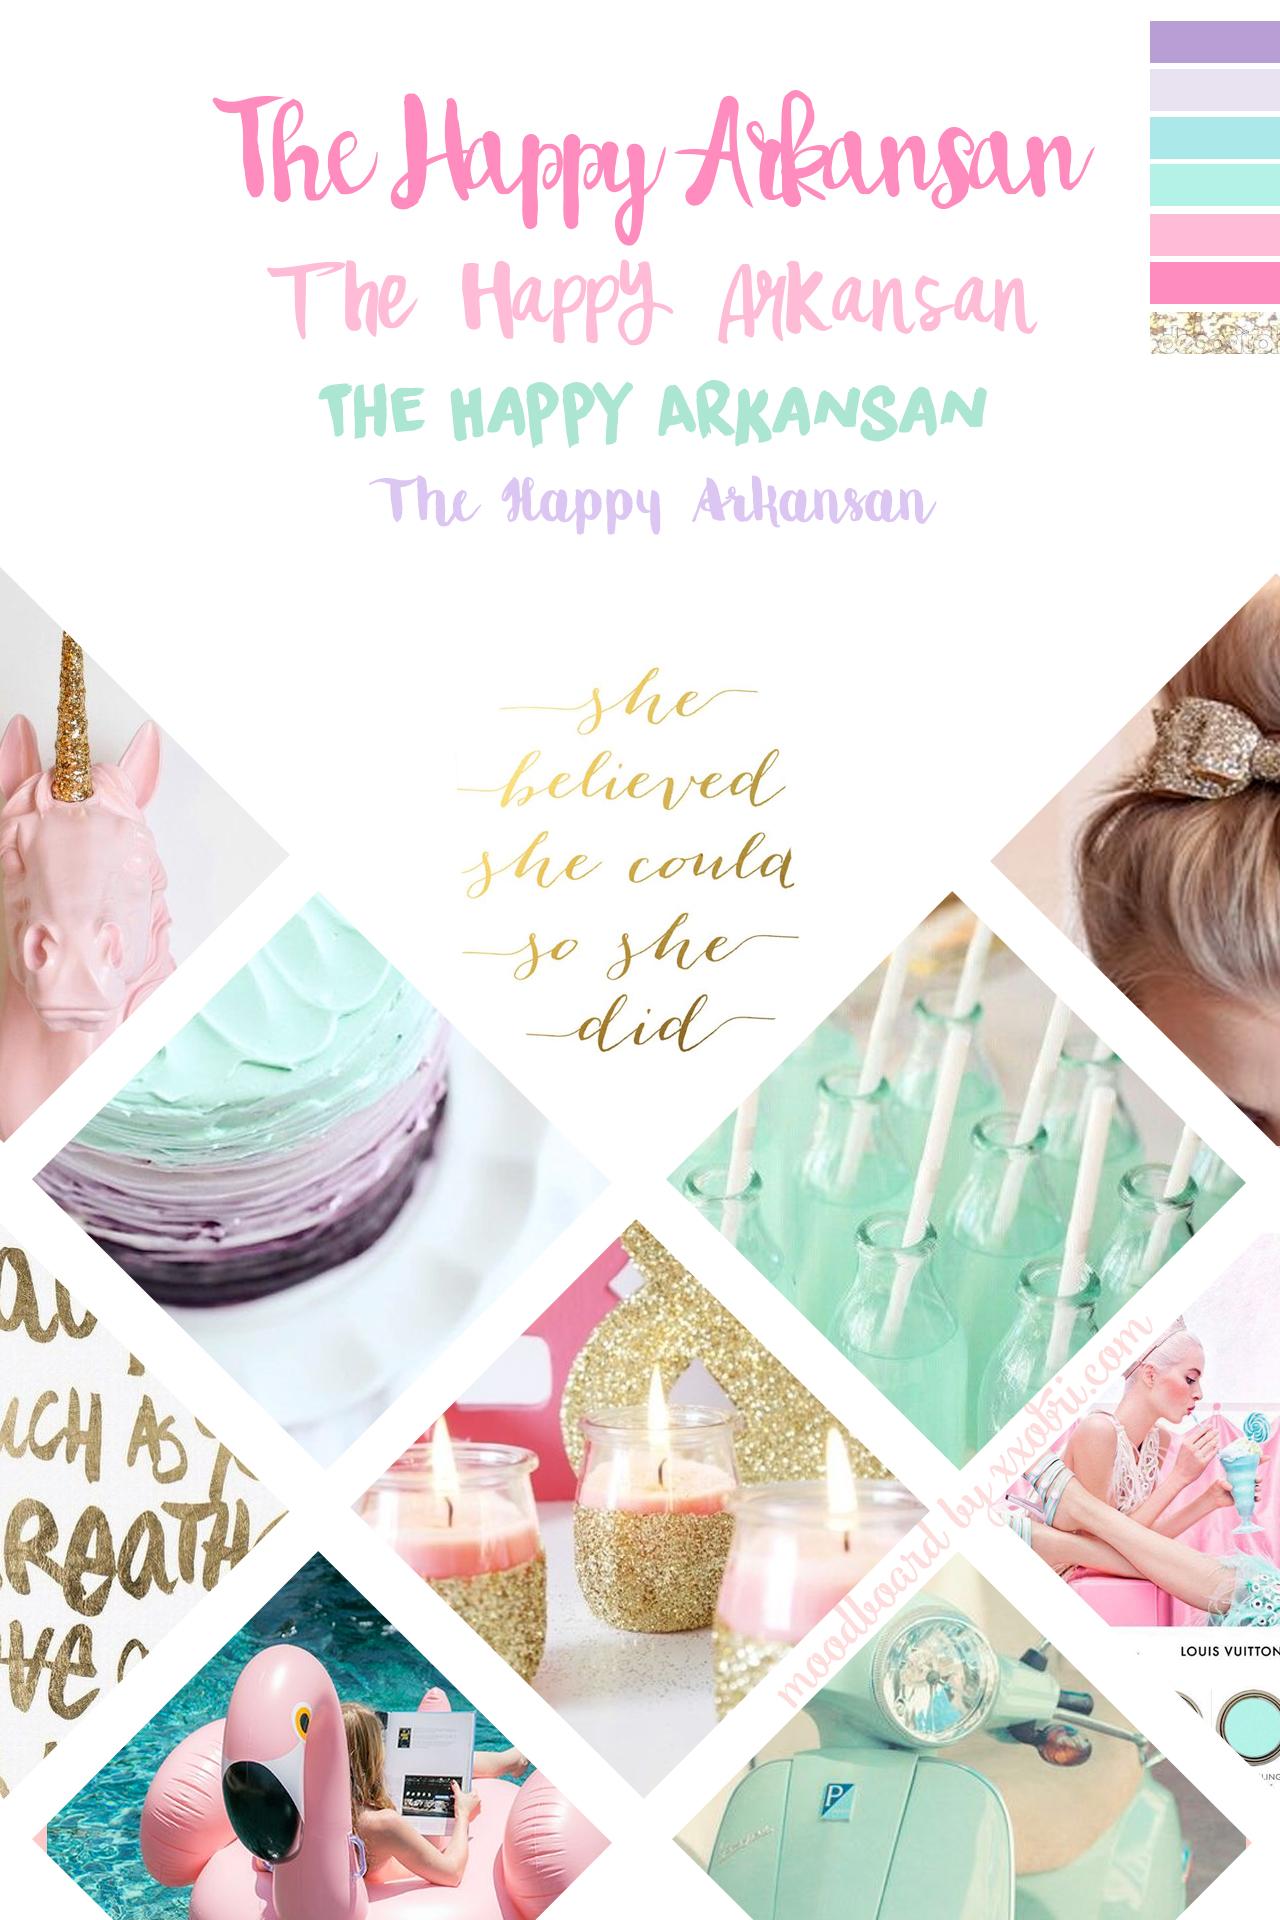 THEHAPPYARKANSAN.COM